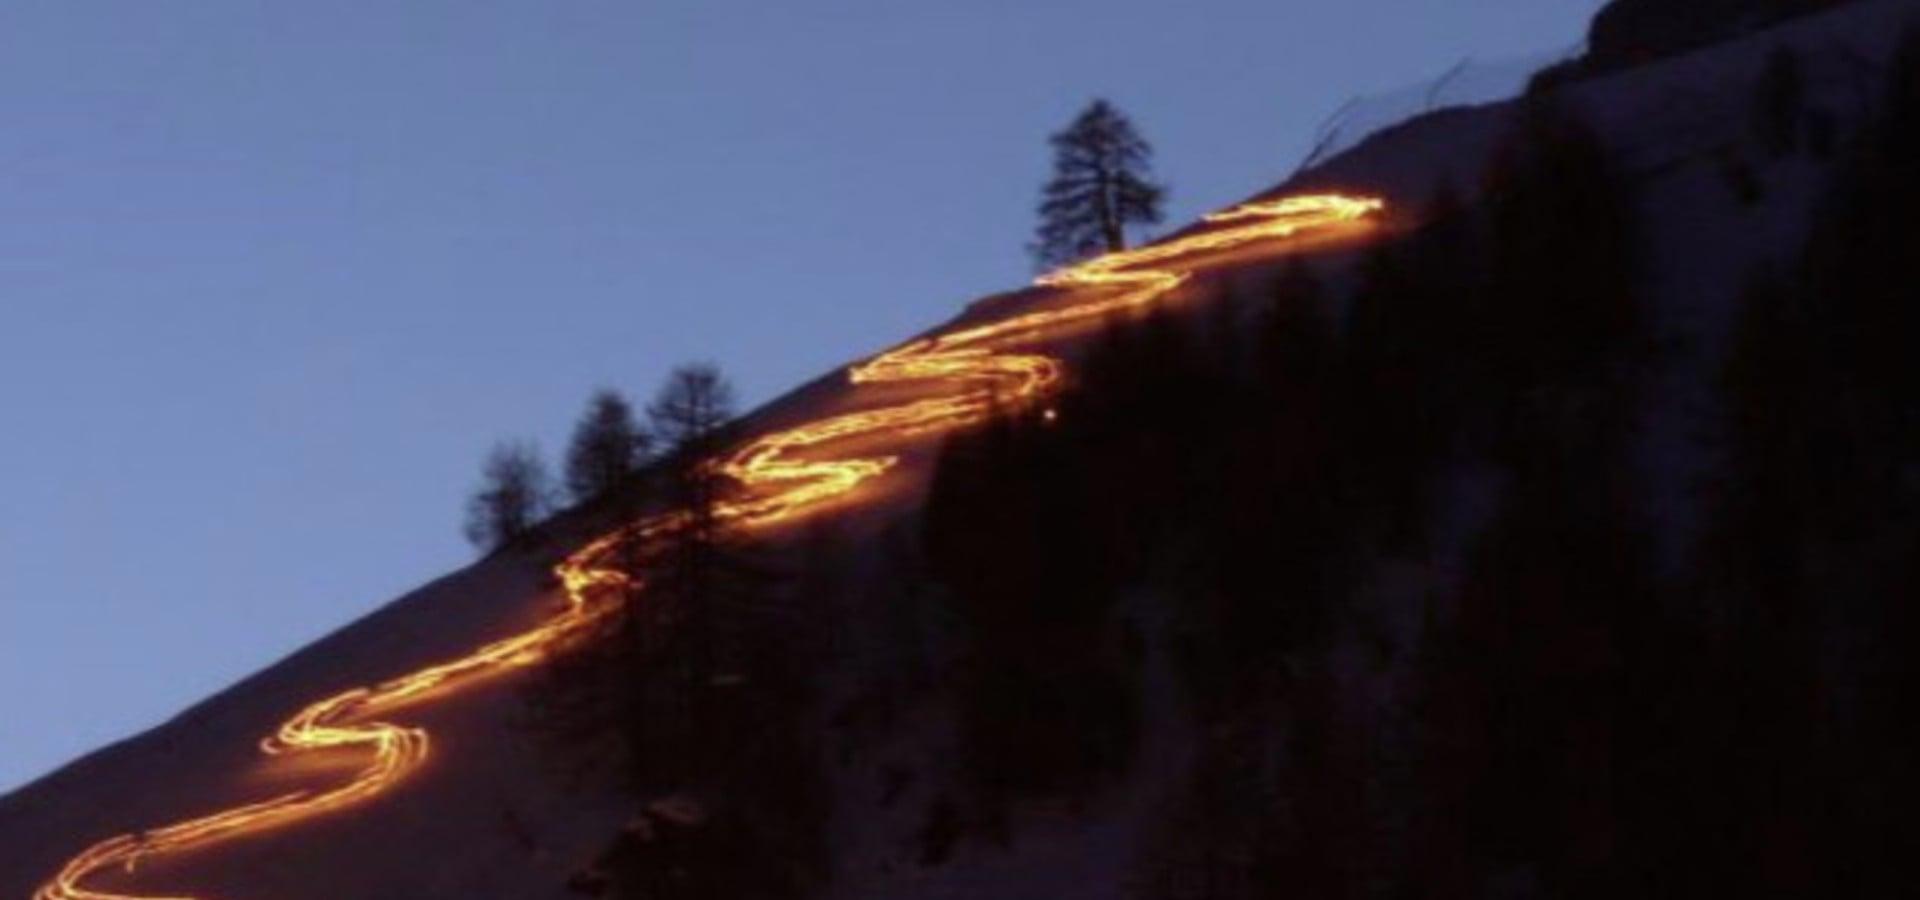 04.01.19 Dreikönigs-Fackelabfahrt